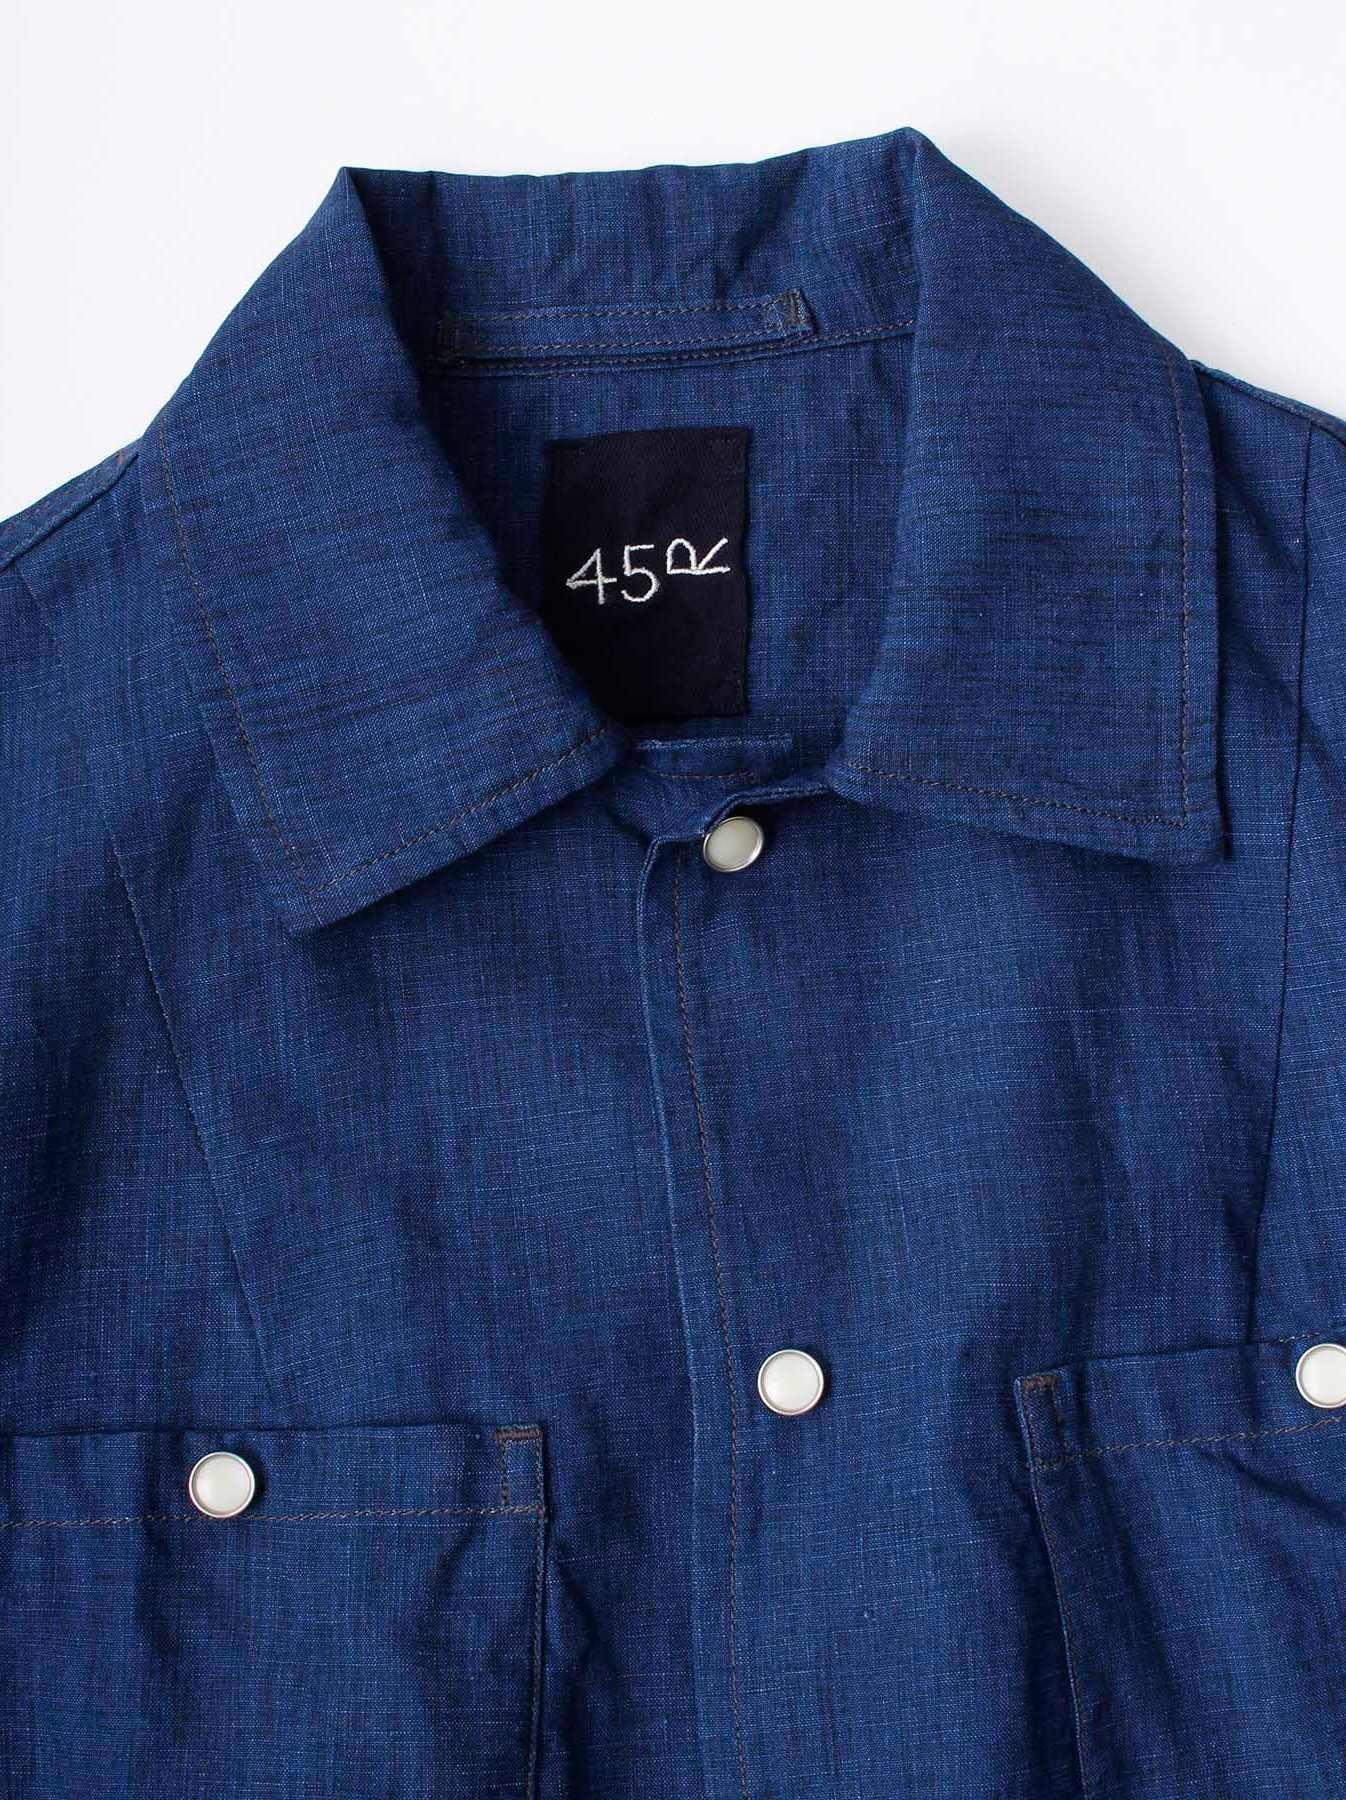 WH Indigo Linen Jean Jacket Bolero-6